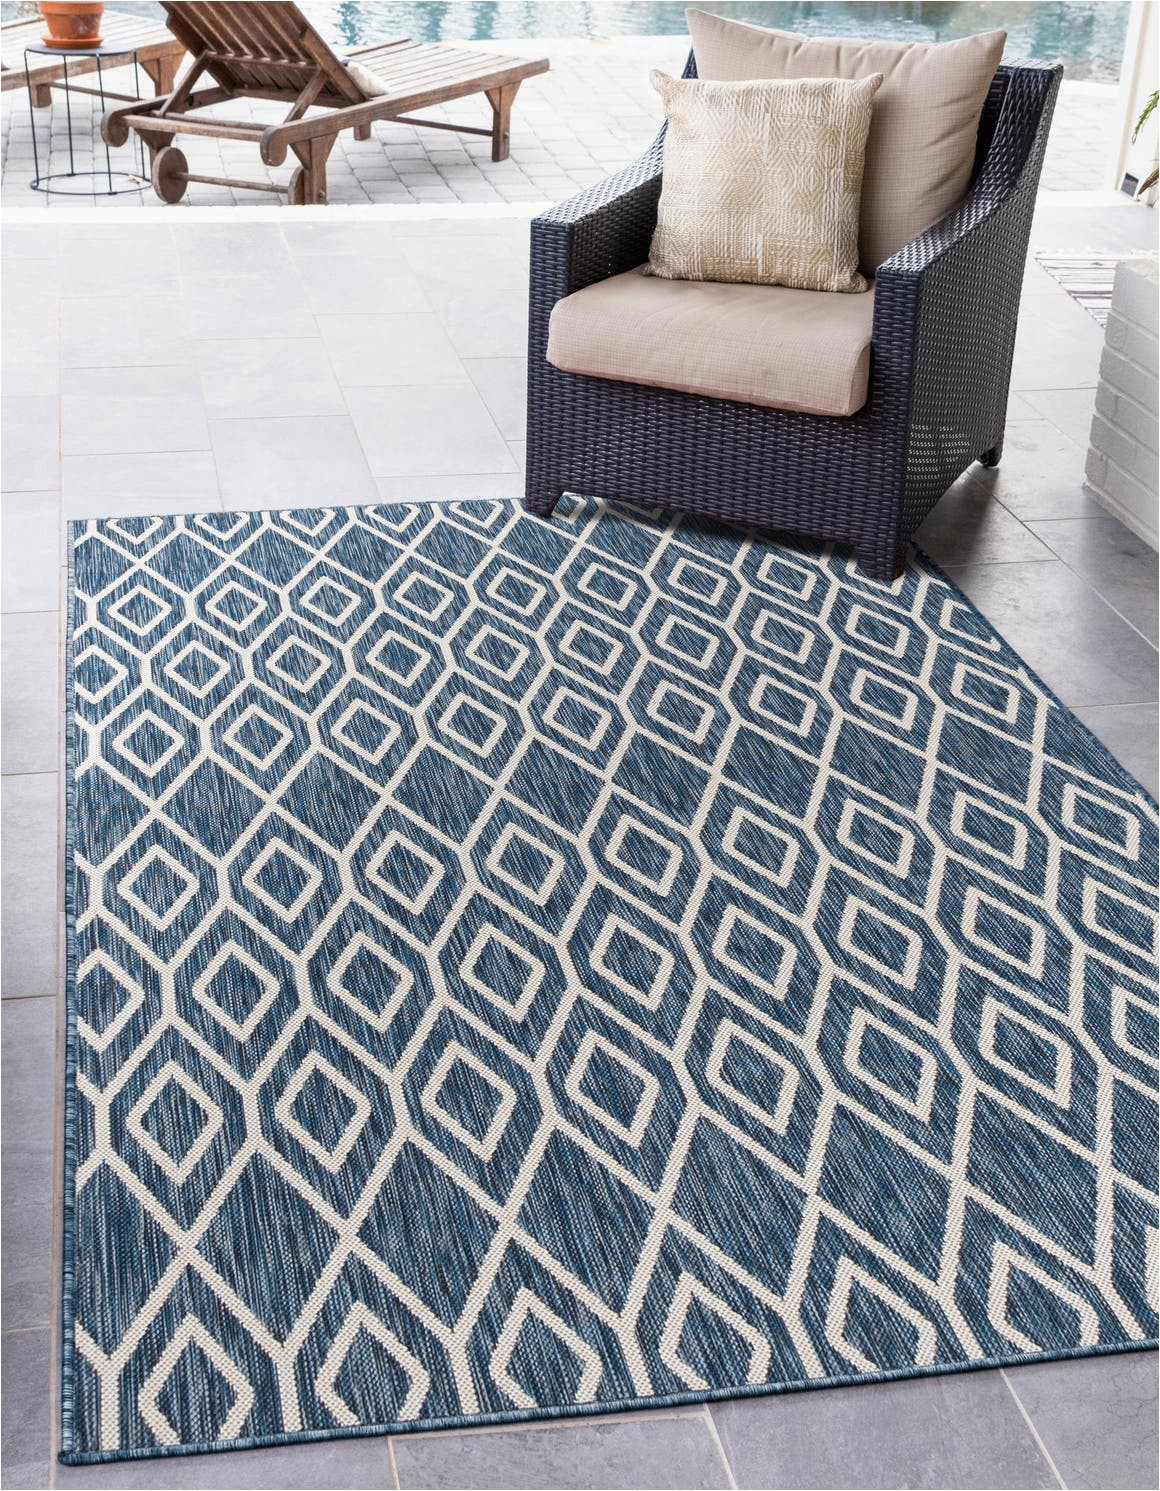 blue 4x6 jill zarin outdoor area rug